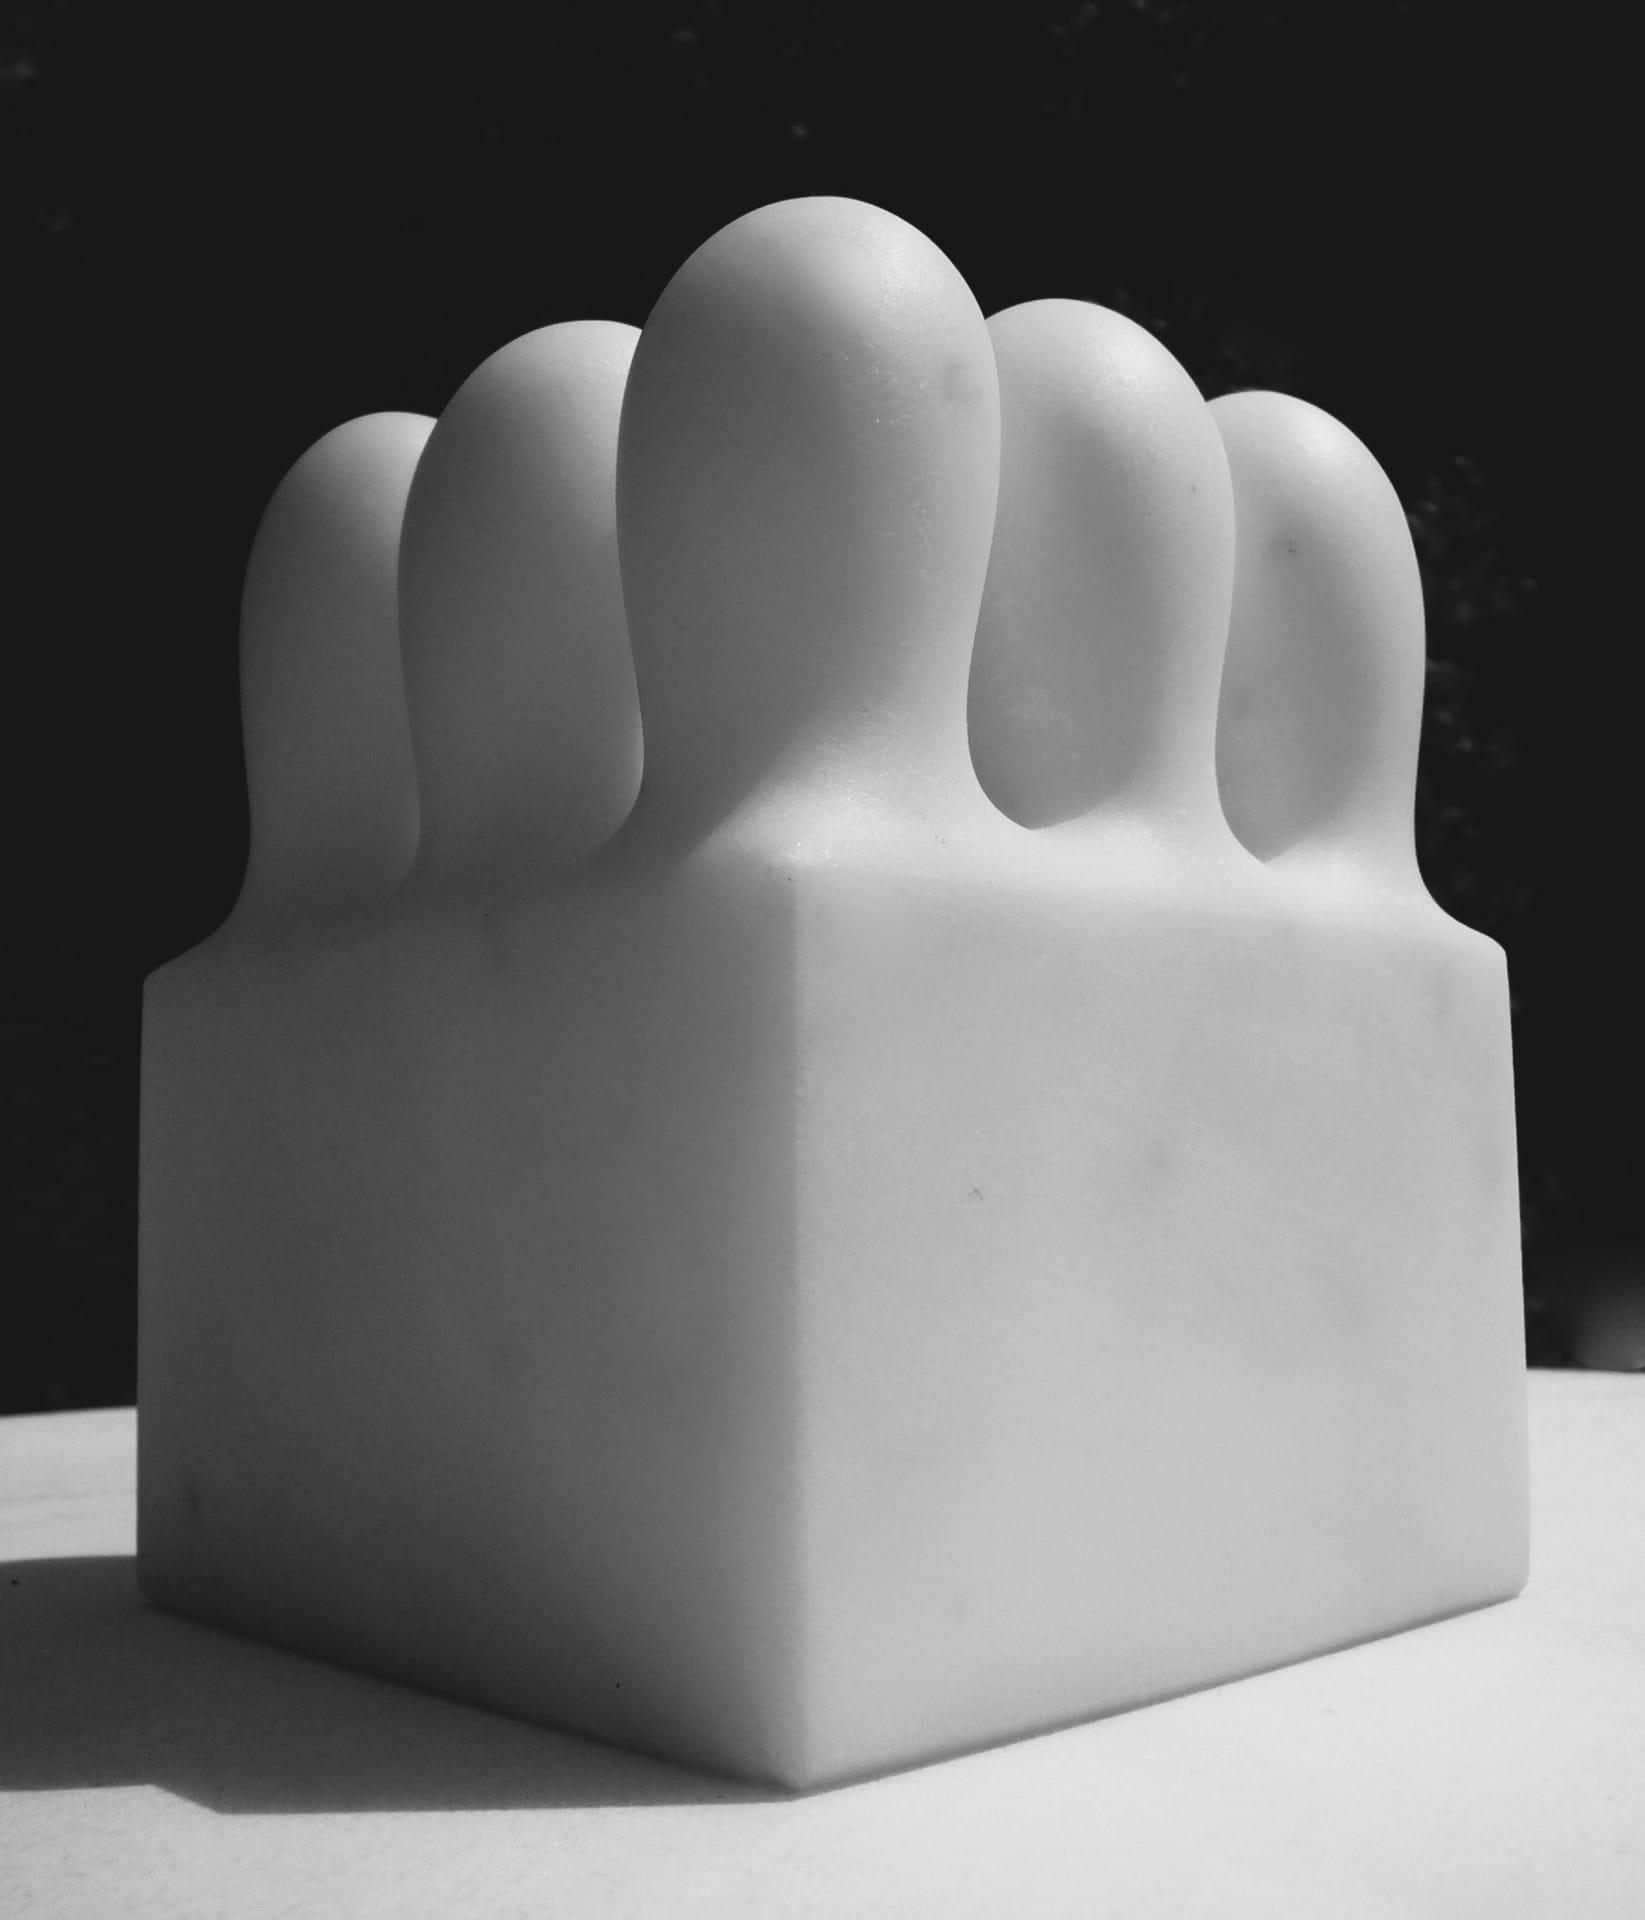 Sven Rünger: Modul, 2008 (Statuario Marmor)